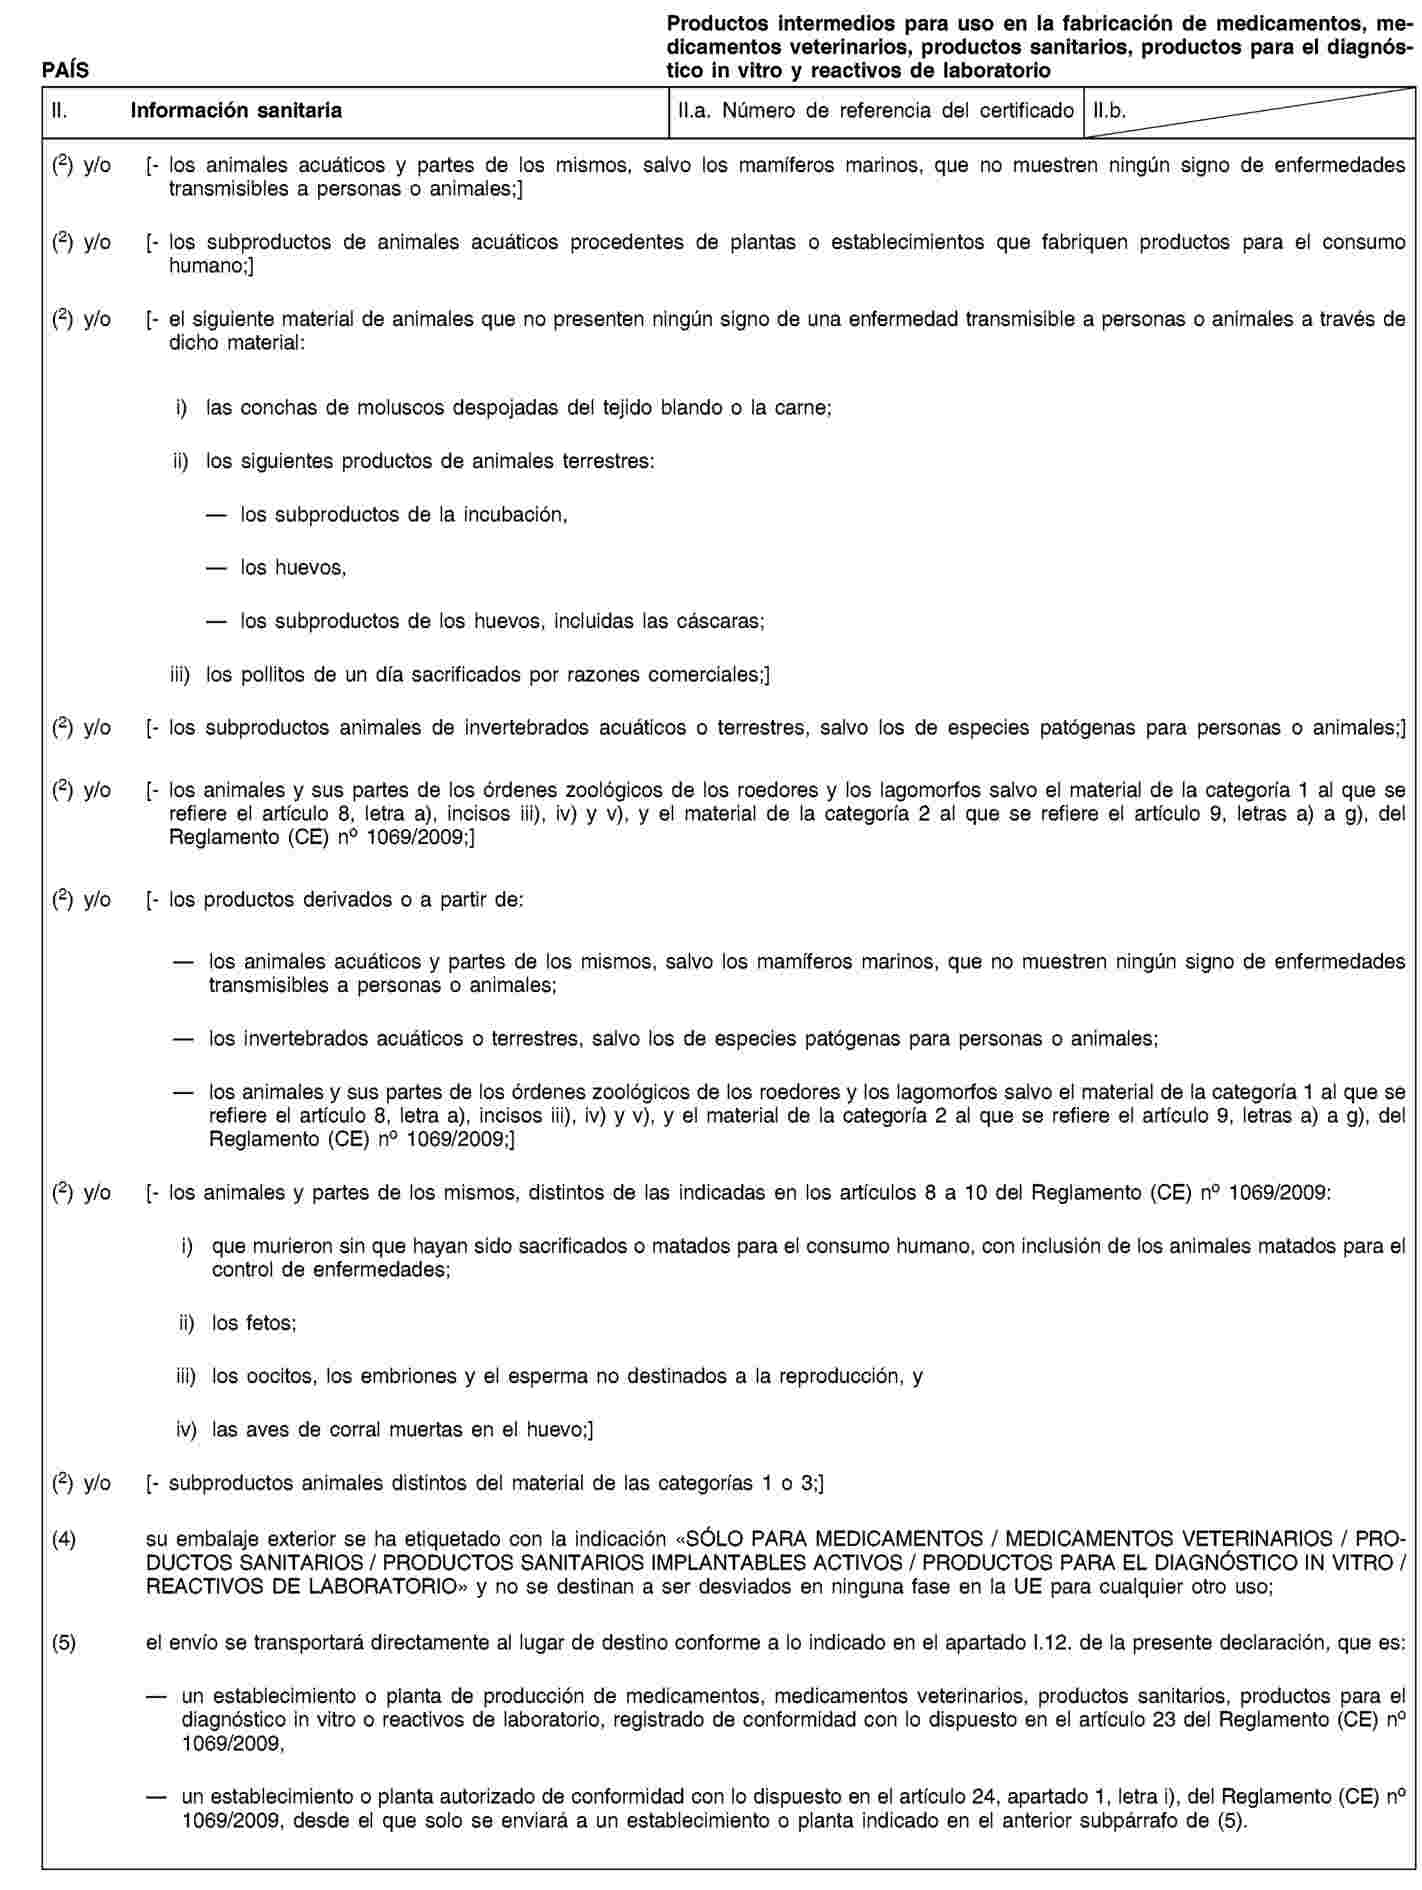 Imagen: https://eur-lex.europa.eu/resource.html?uri=uriserv:OJ.L_.2011.054.01.0001.01.SPA.xhtml.L_2011054ES.01024701.tif.jpg